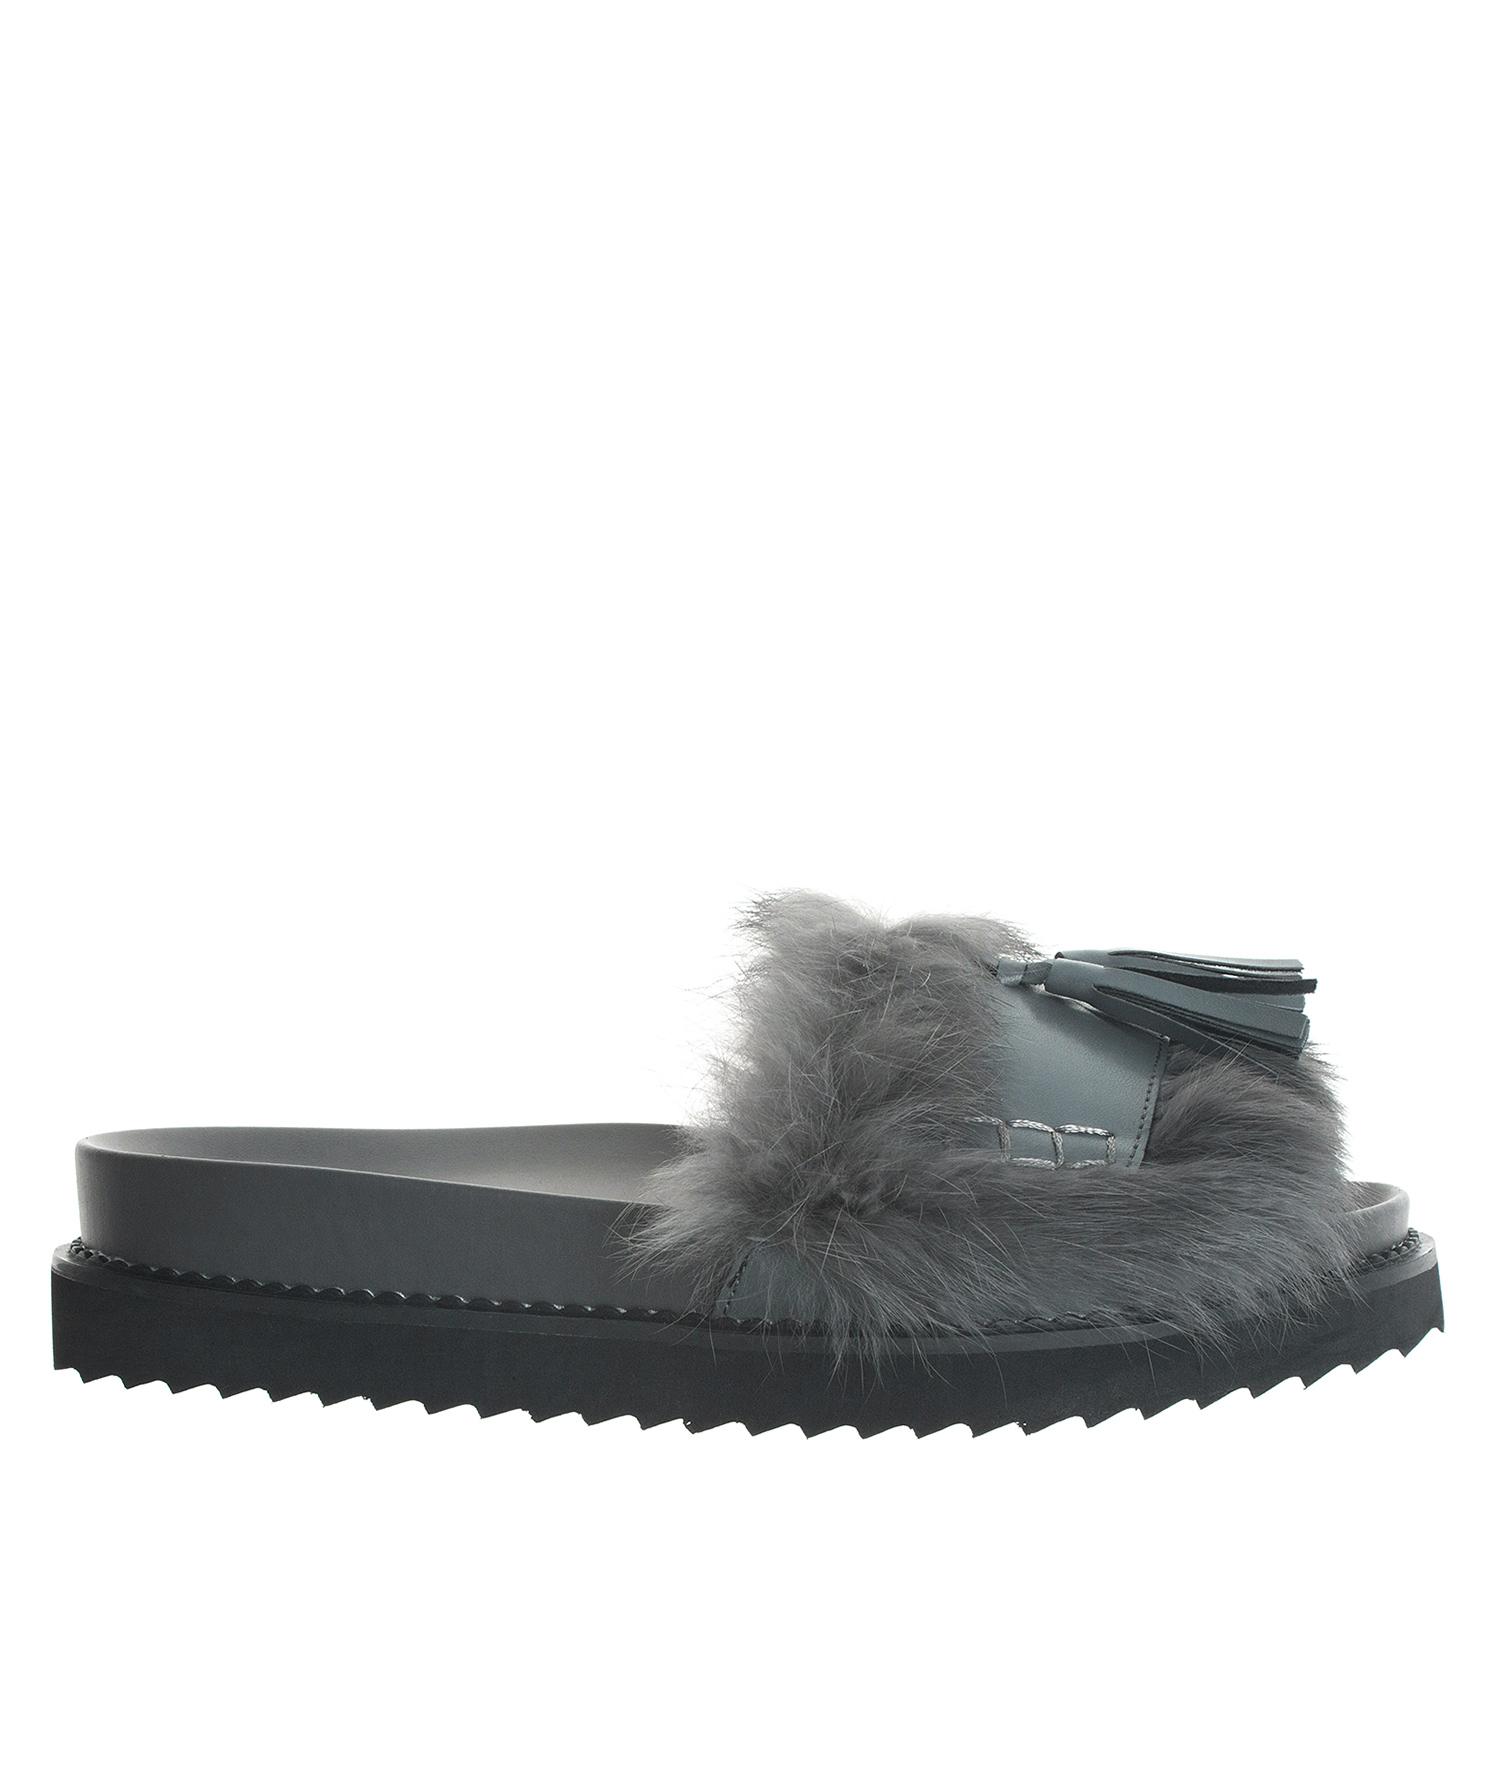 1c12bc1d996b AnnaKastle Womens Cute Tassel Fur Slide Sandals Gray